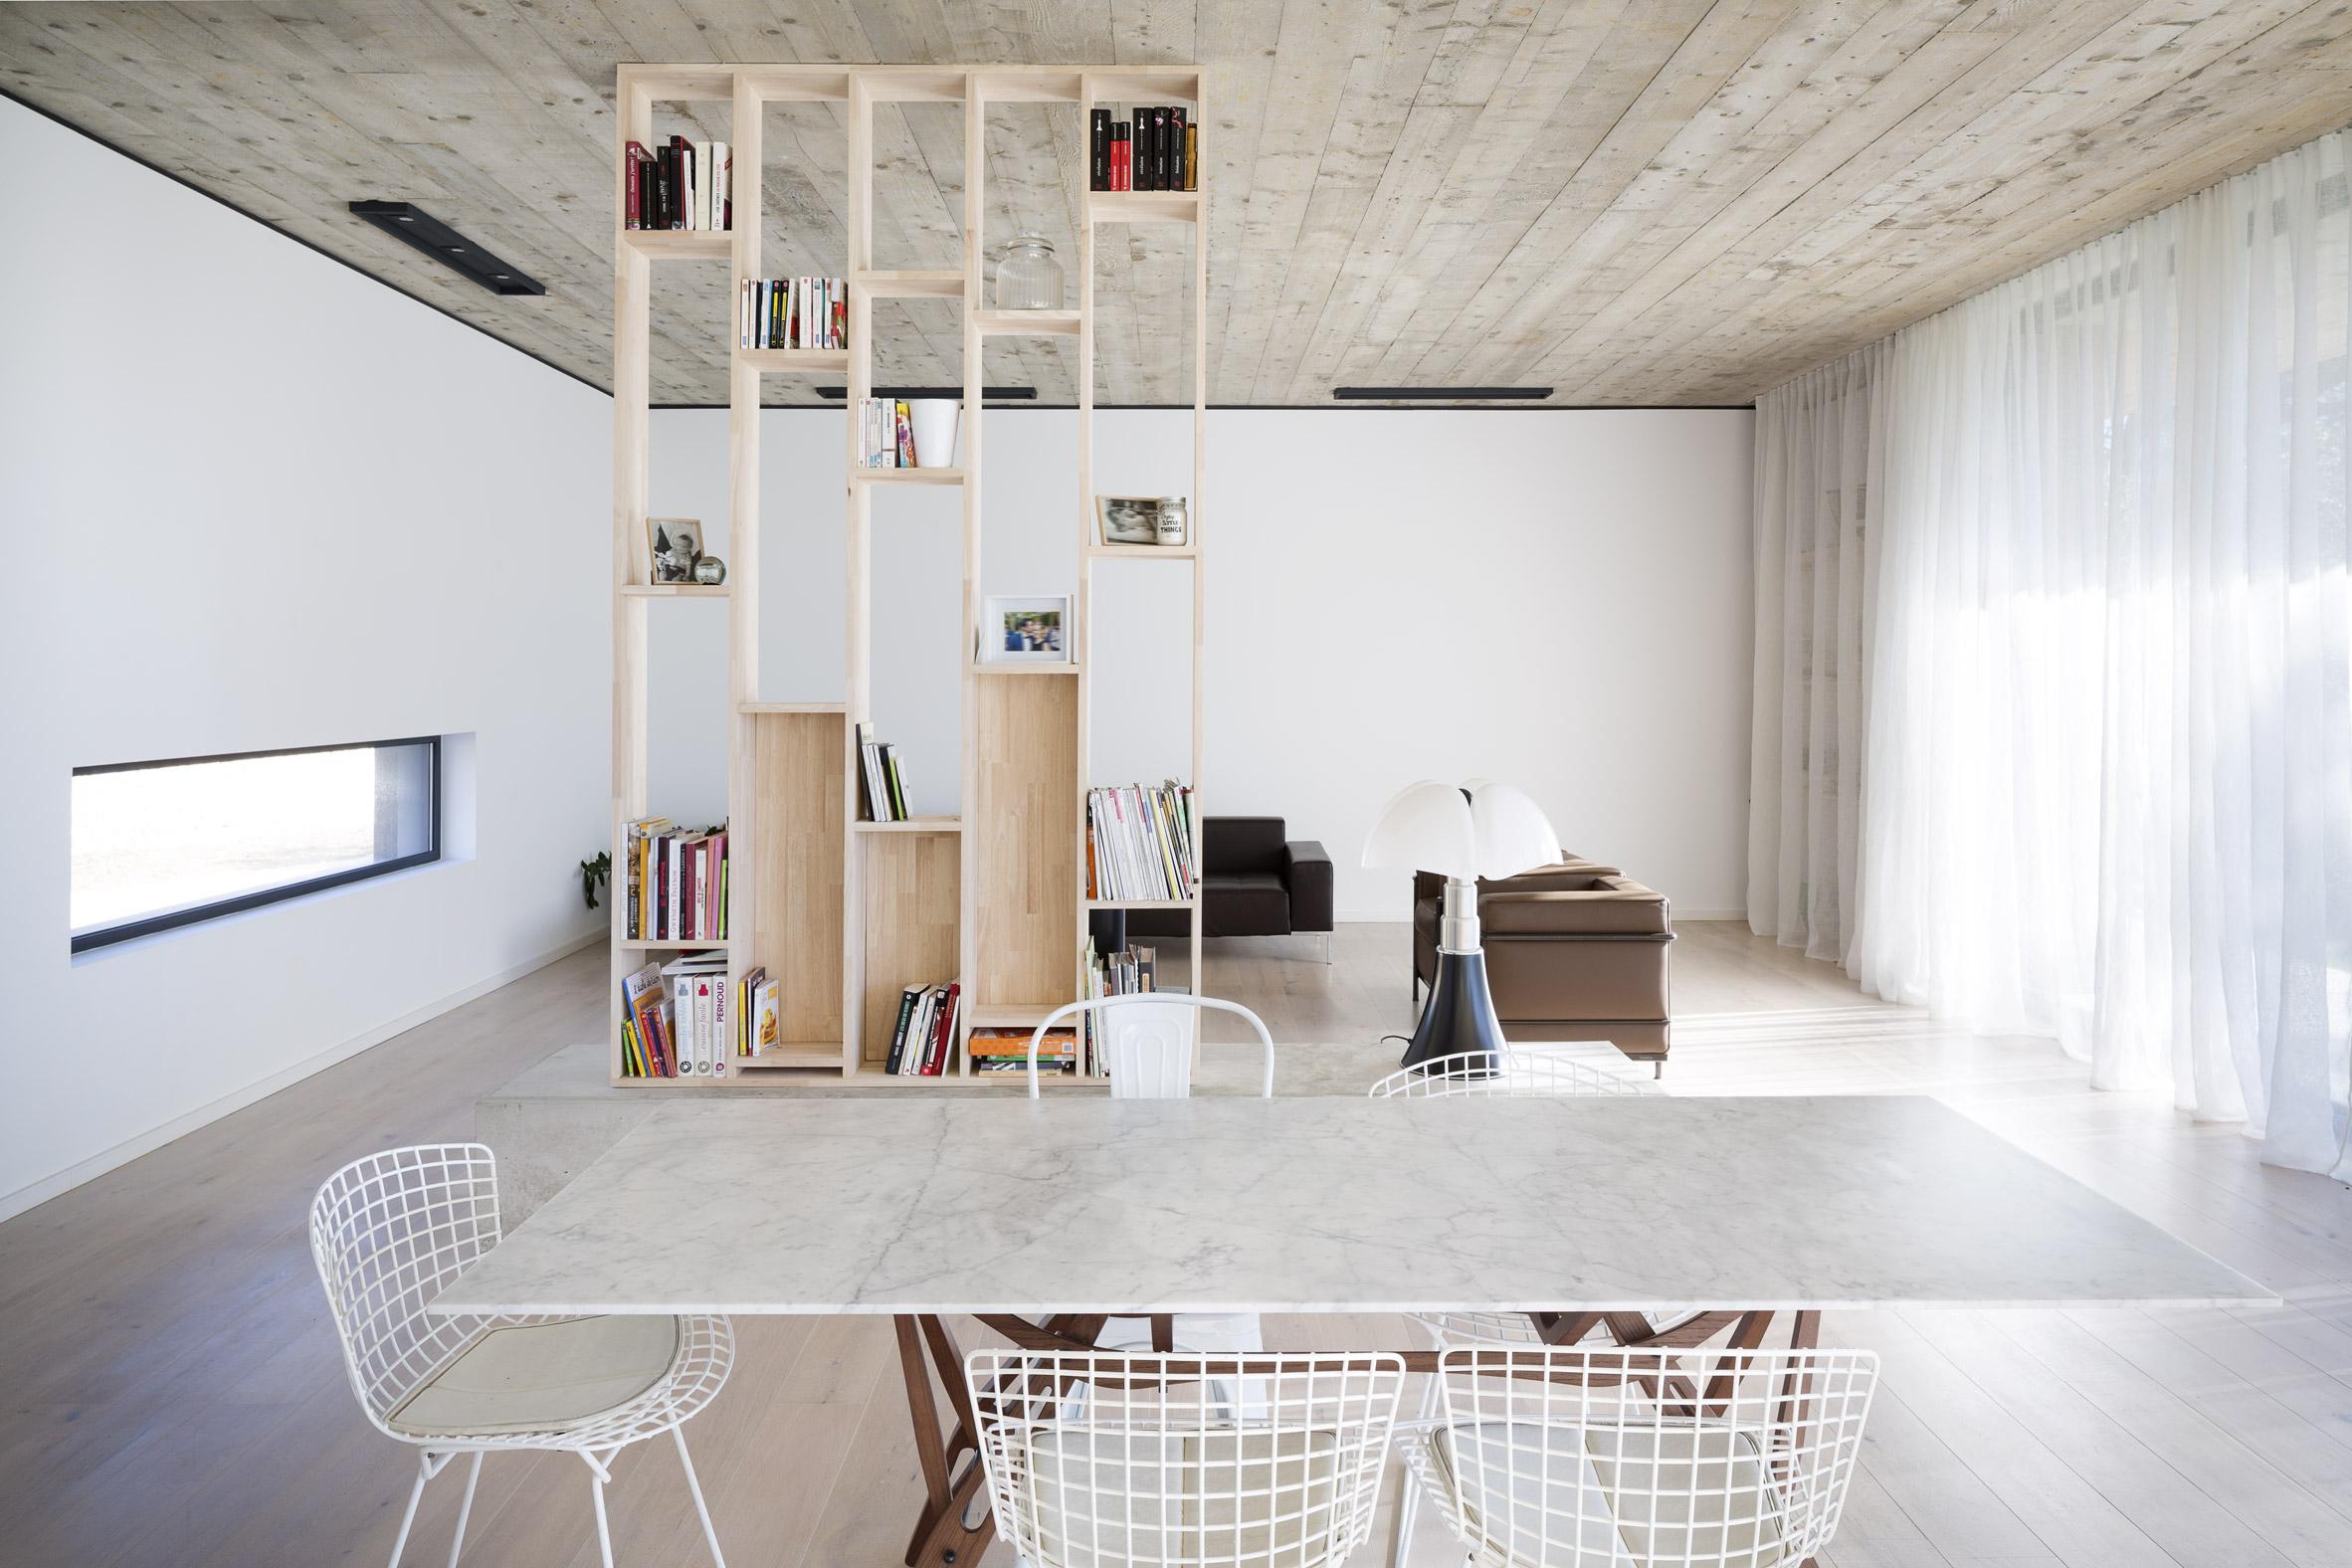 Maison 0.82 by Planchard Violaine